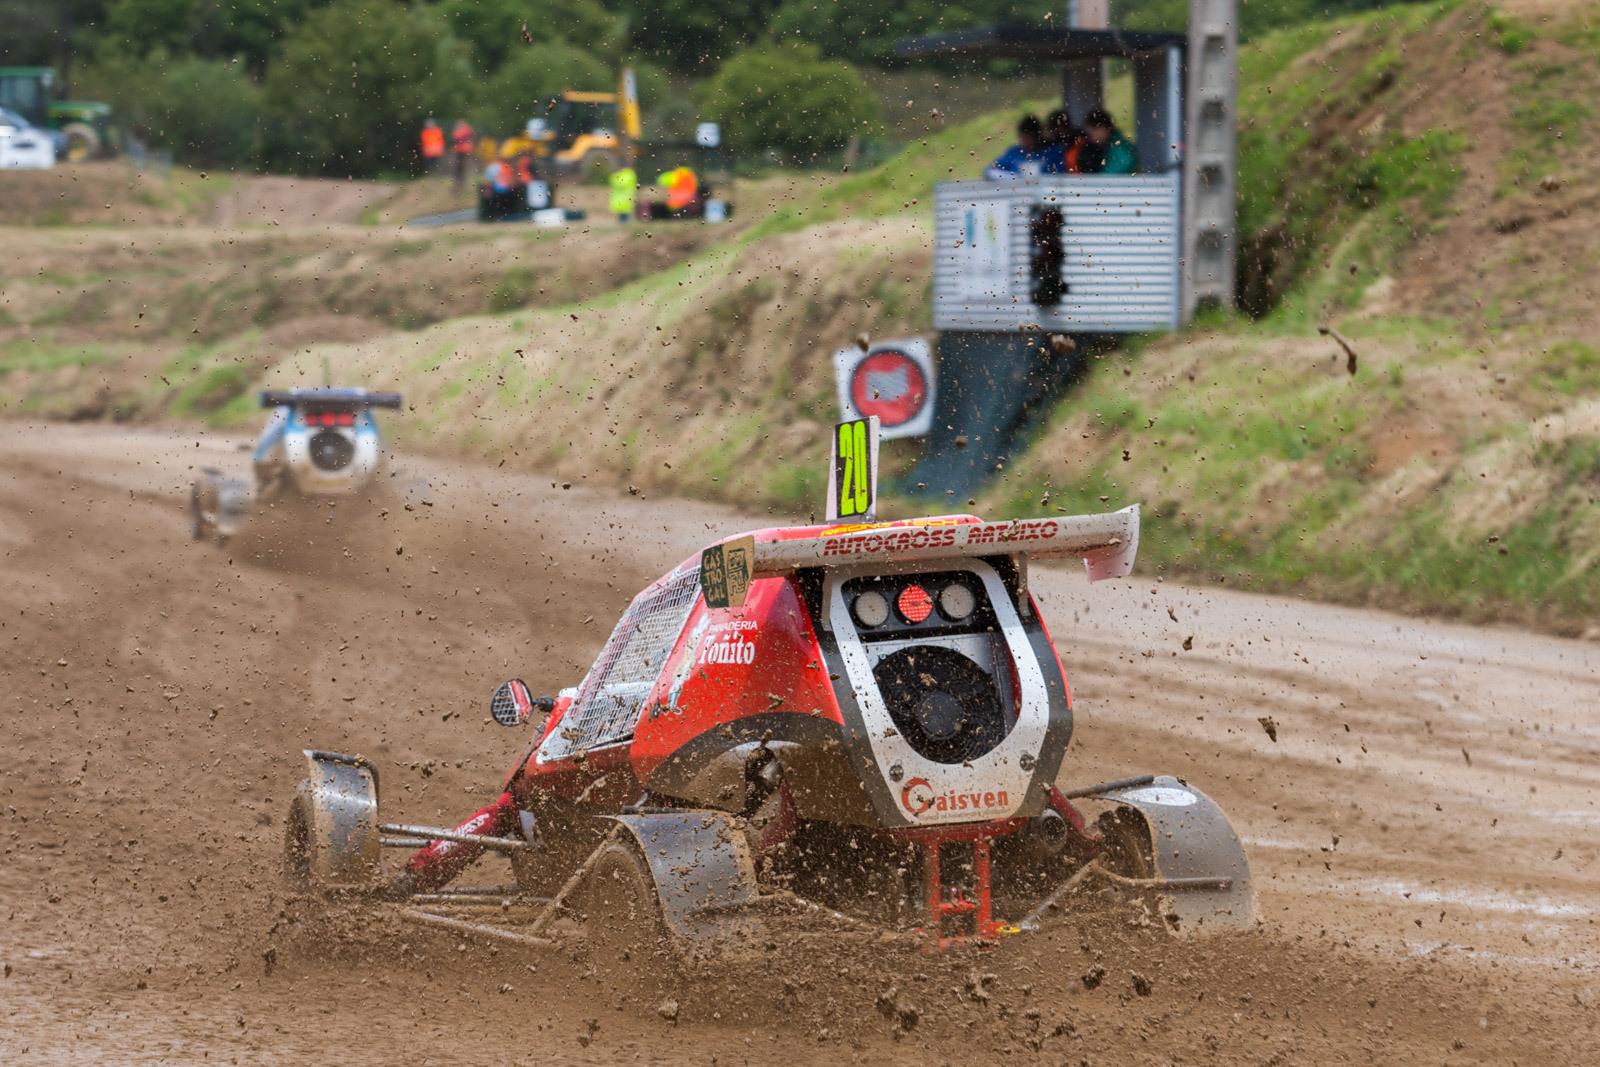 005 Autocross Carballo FGA 2016 014